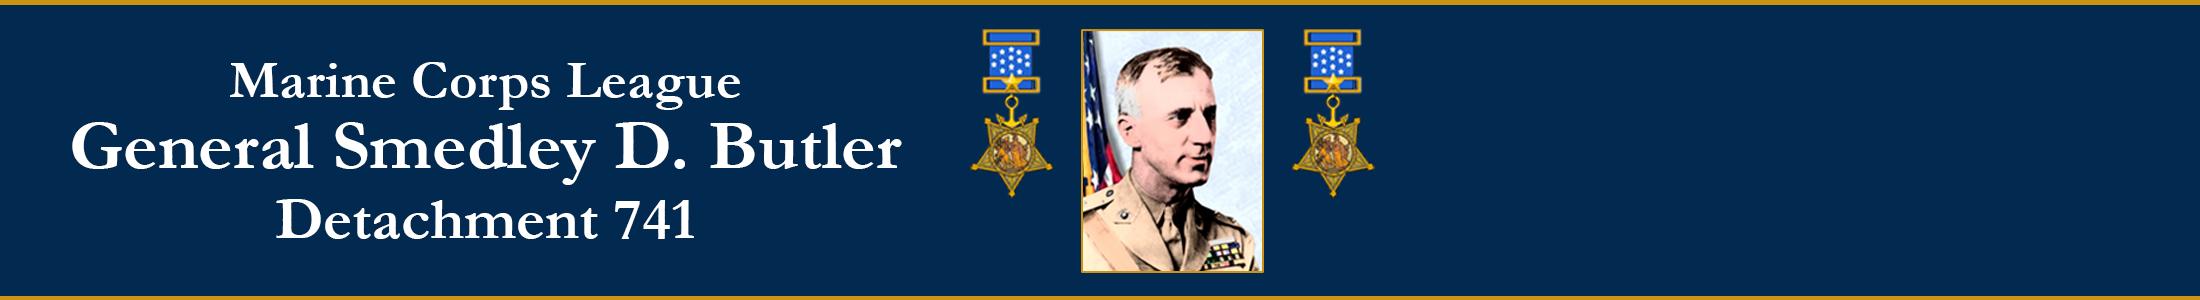 Philadelphia Marine Corps League